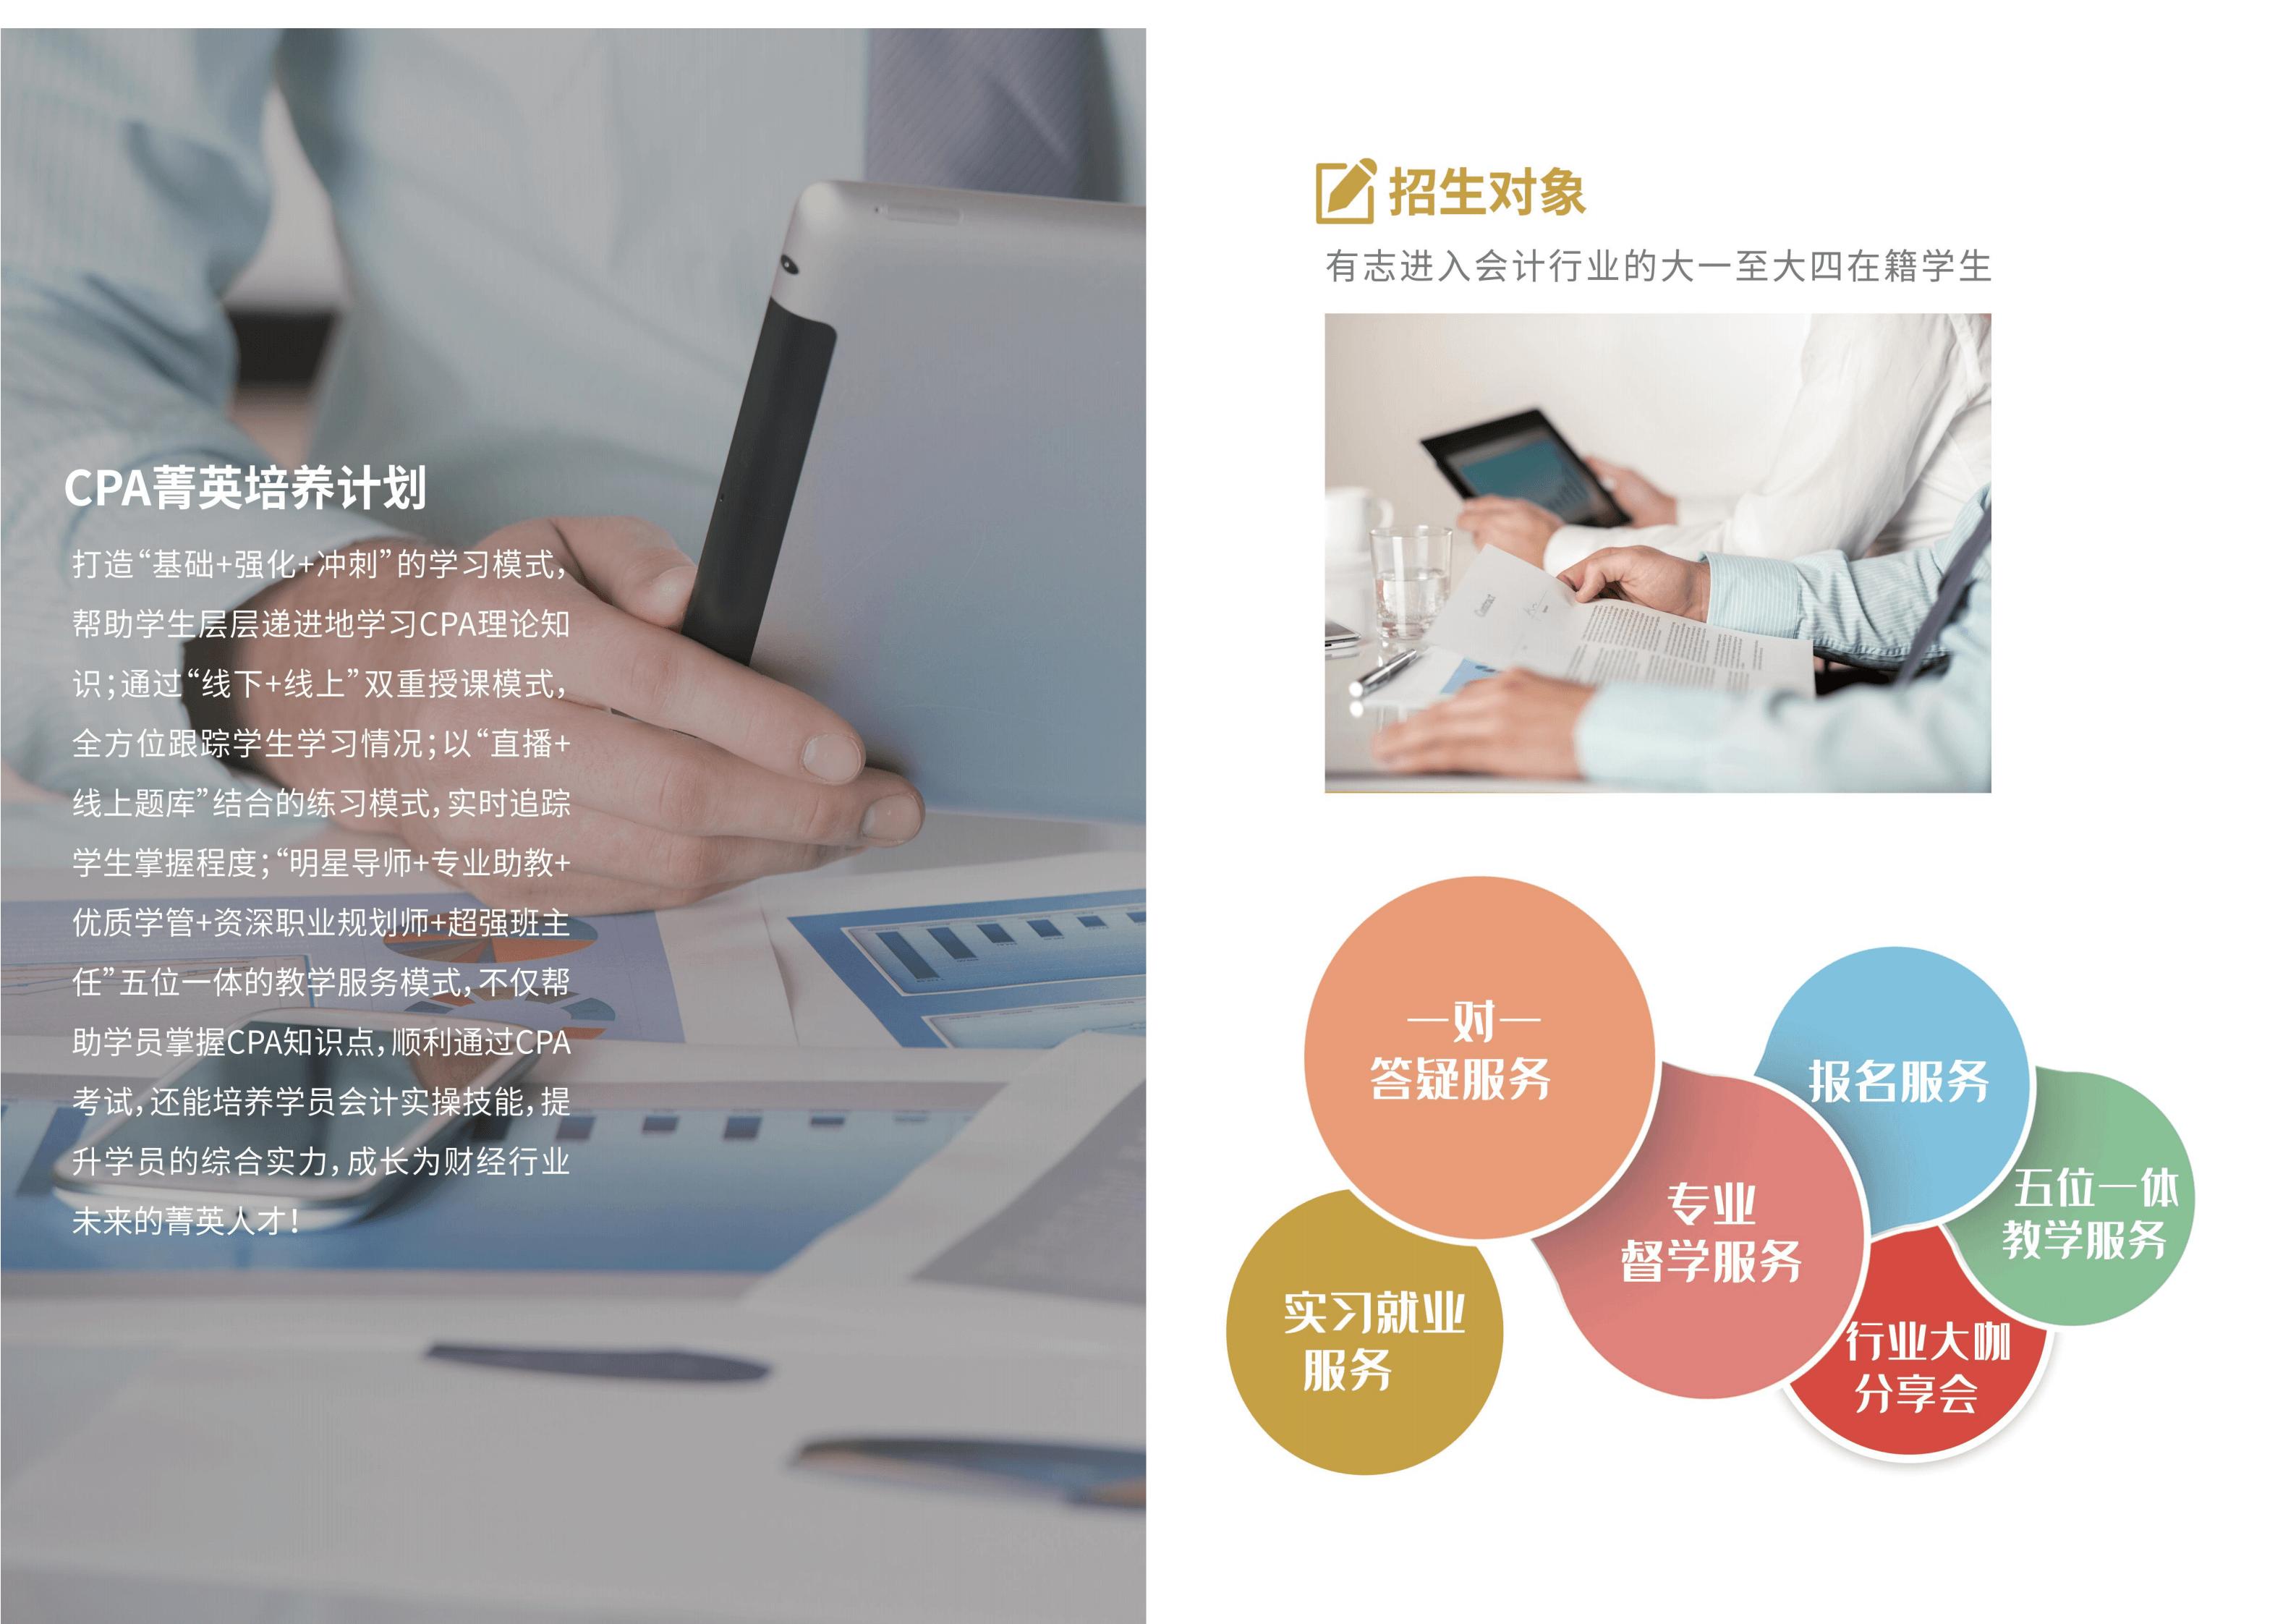 CPA简章横版官网_03 (2).png